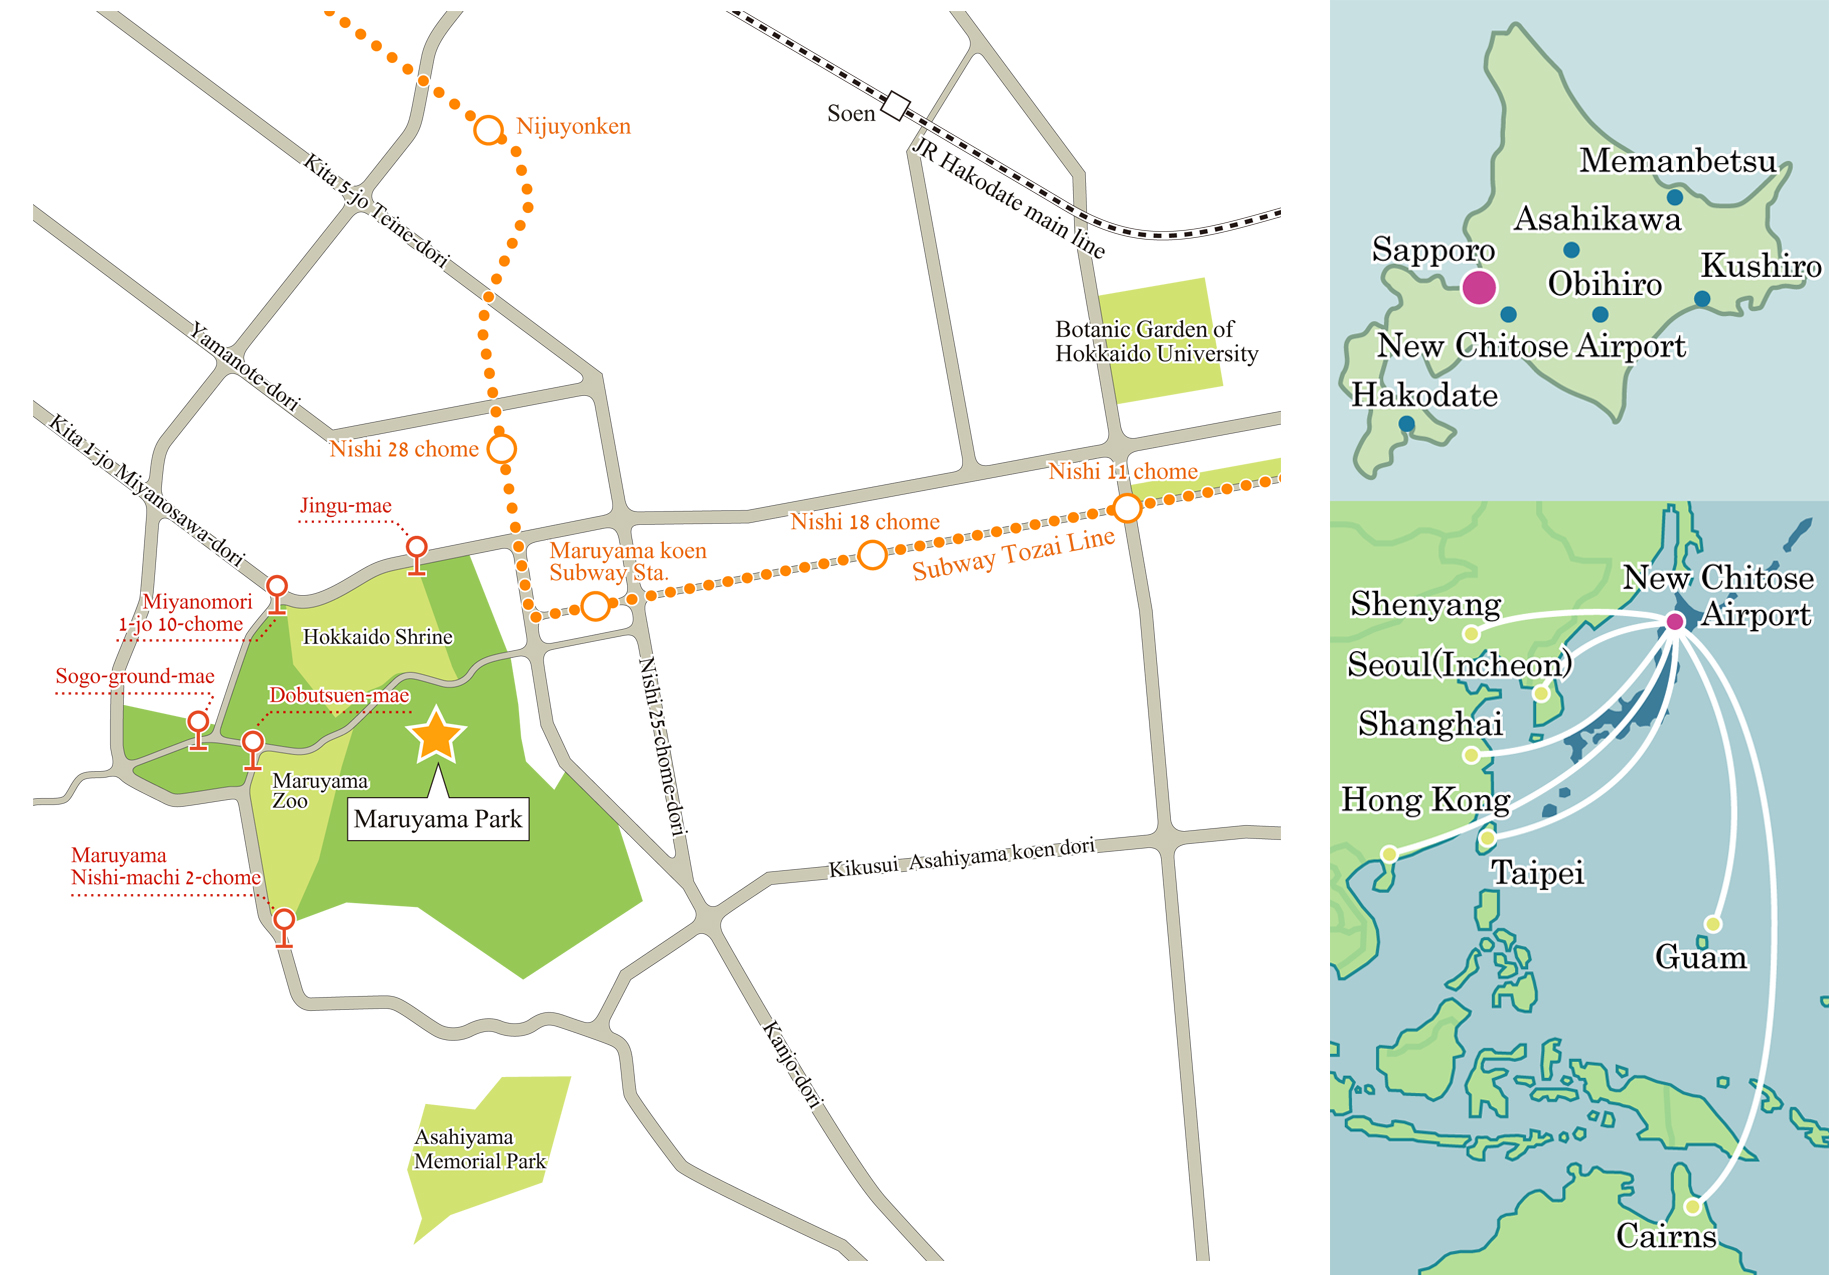 Sapporo Municipal Subway Map.Maruyama Park 円山公園